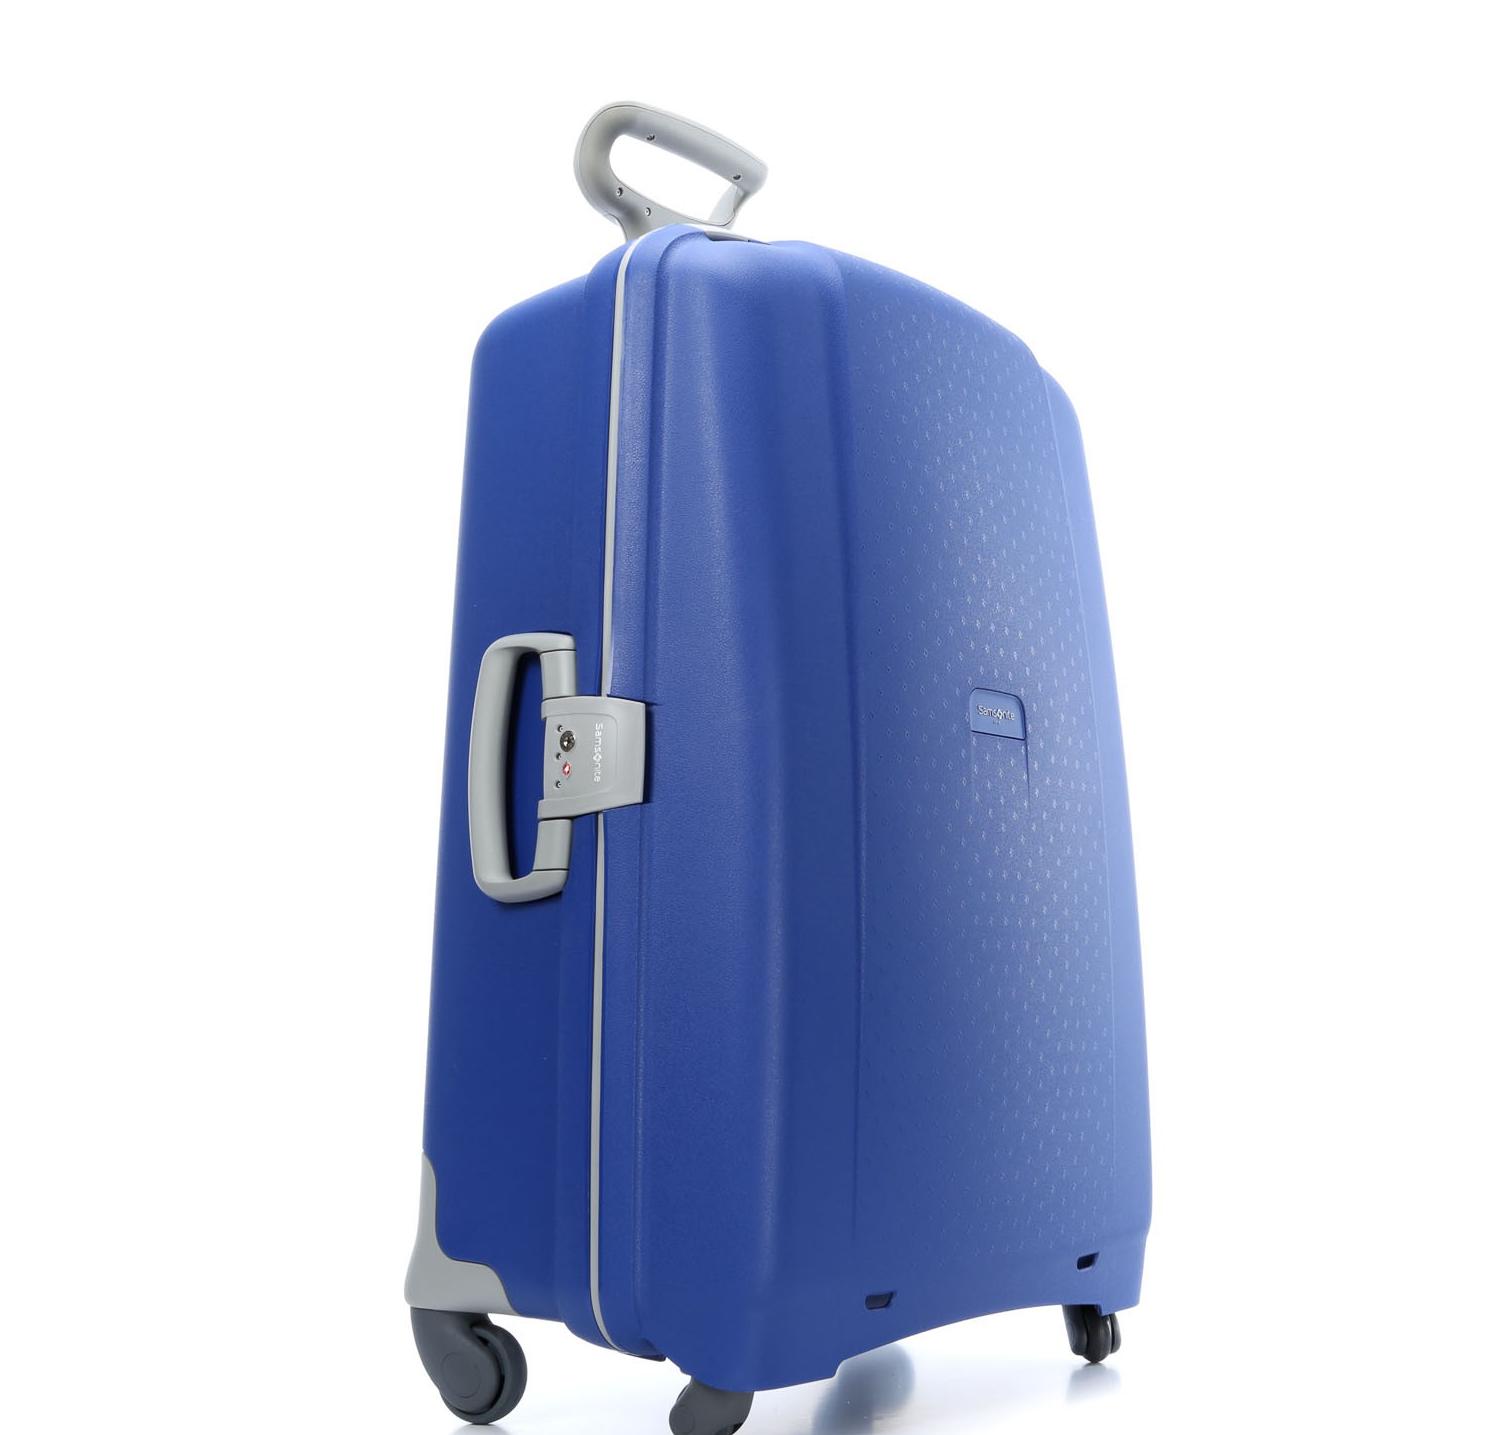 SAMSONITE – Βαλίτσα μεγάλου μεγέθους Samsonite μπλε